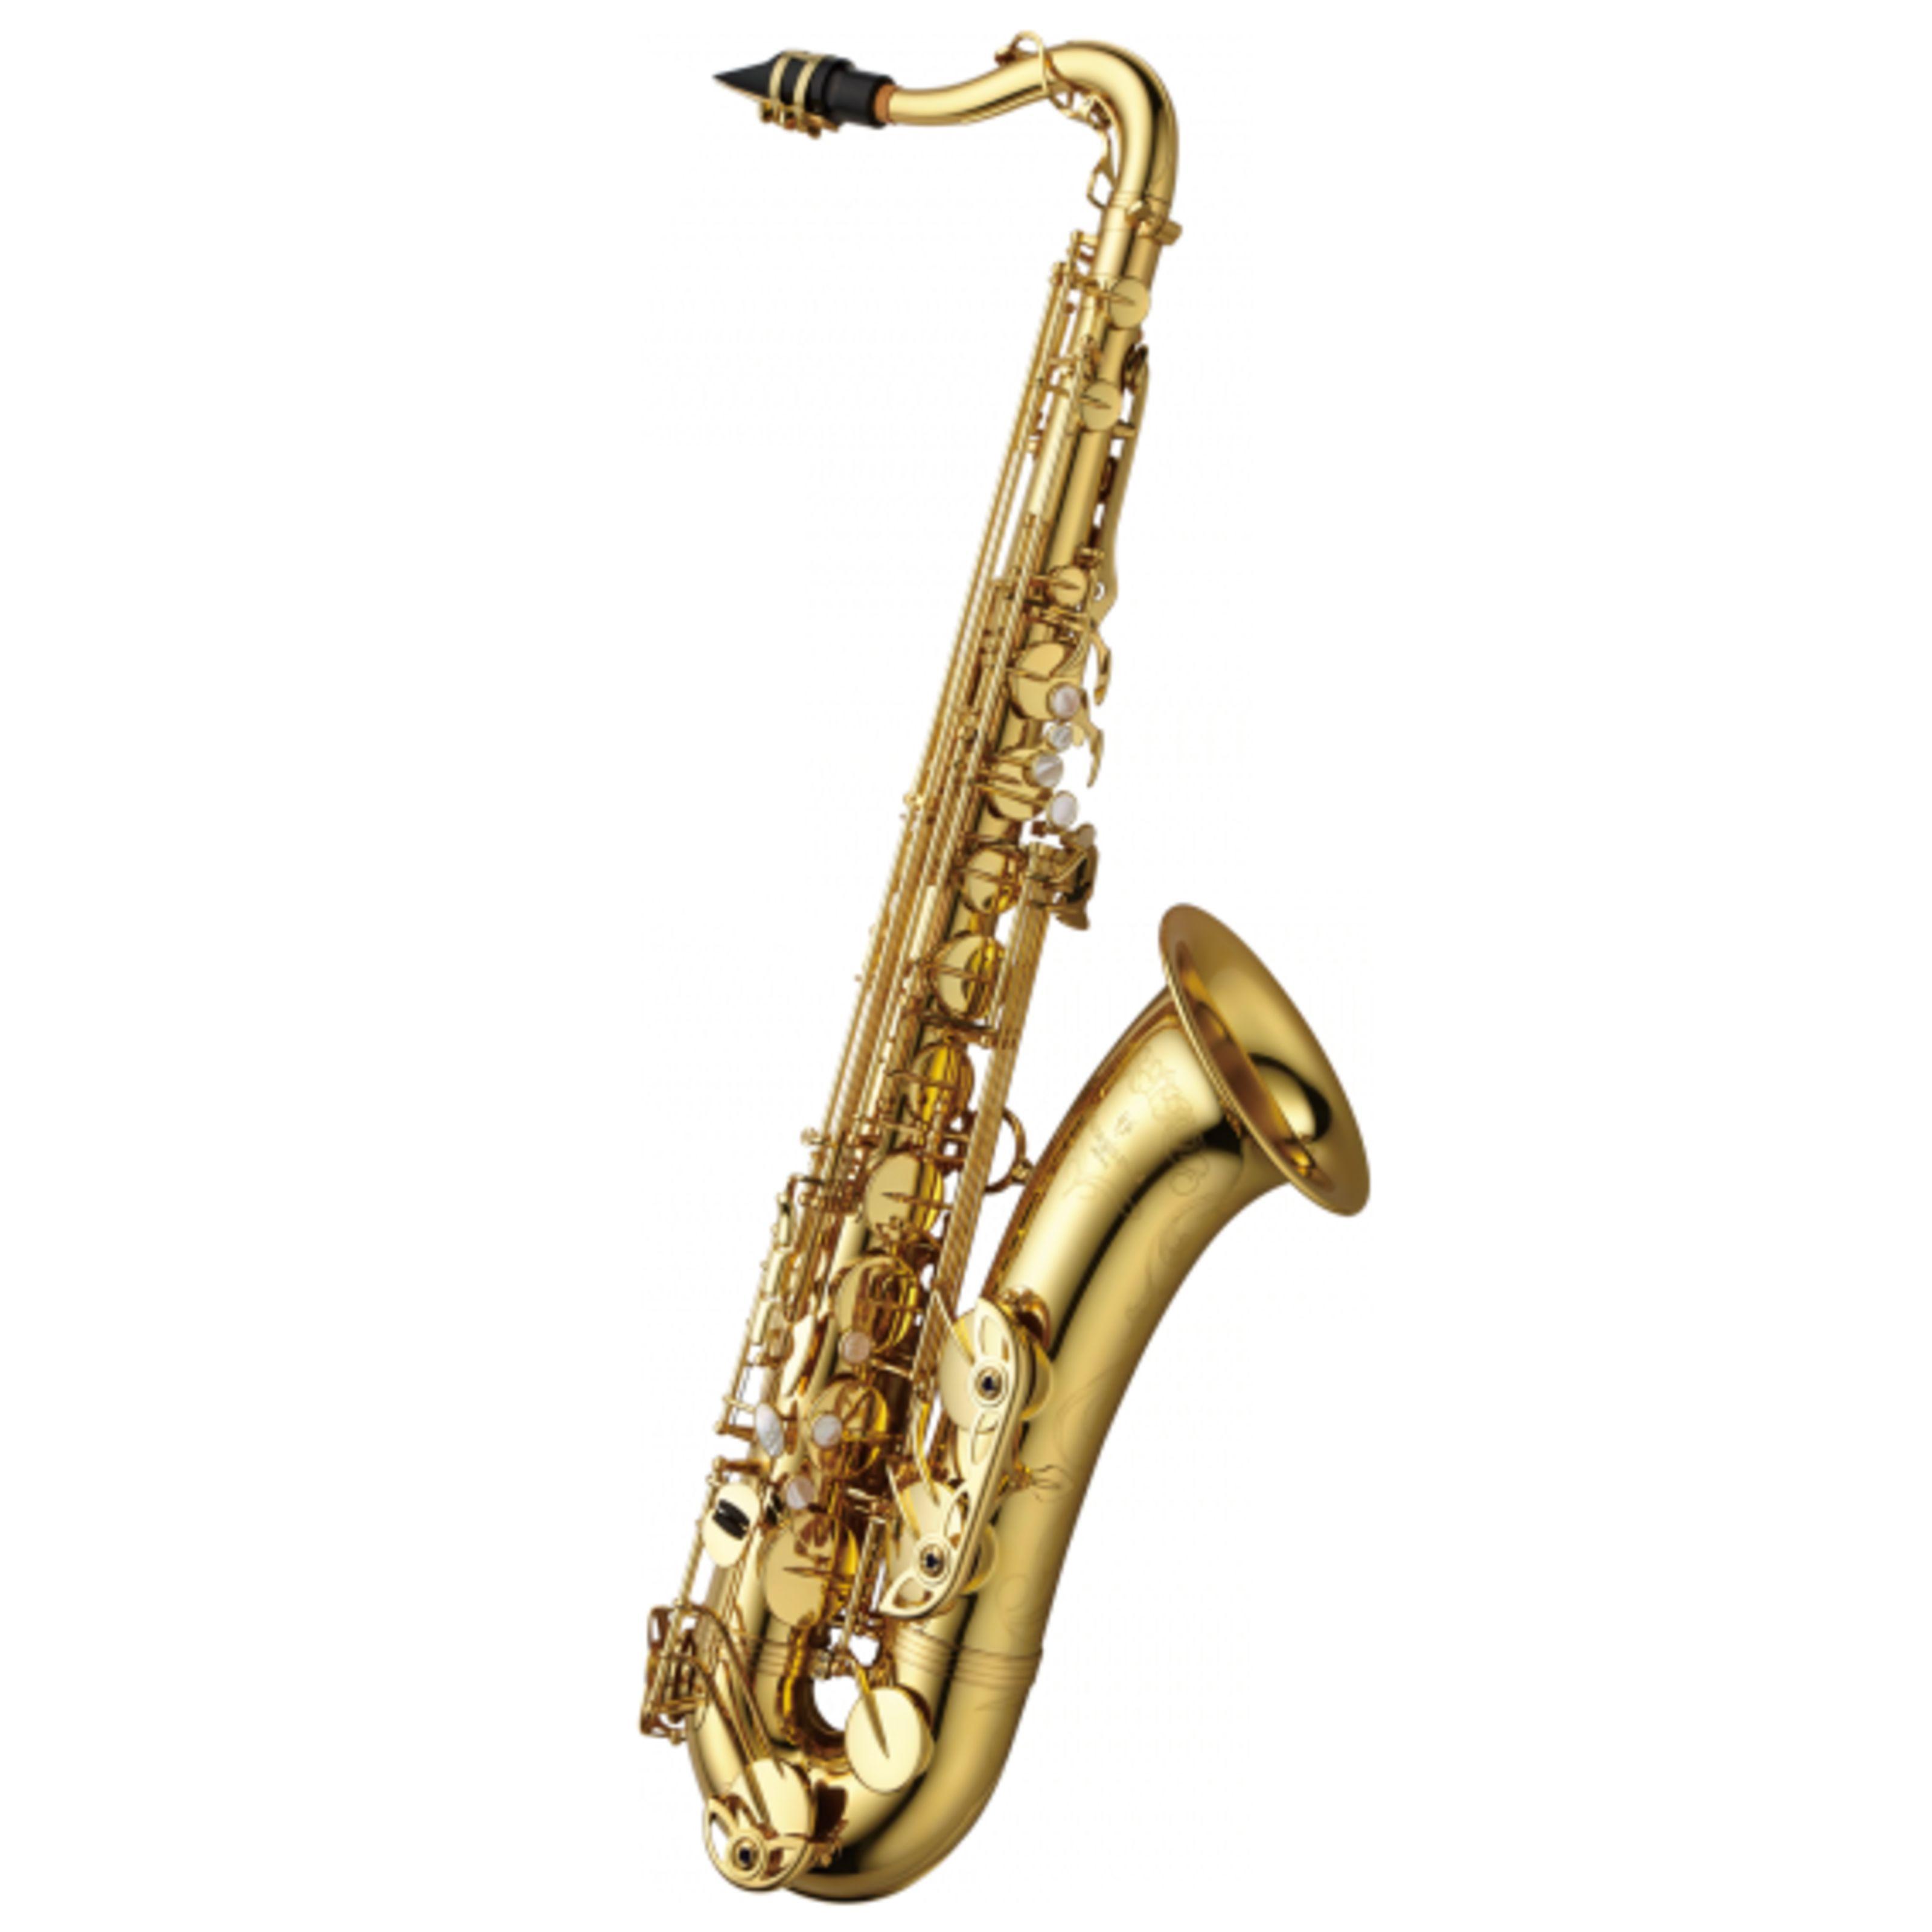 Yanagisawa - T-WO10 Elite Tenor Saxophon 700.729